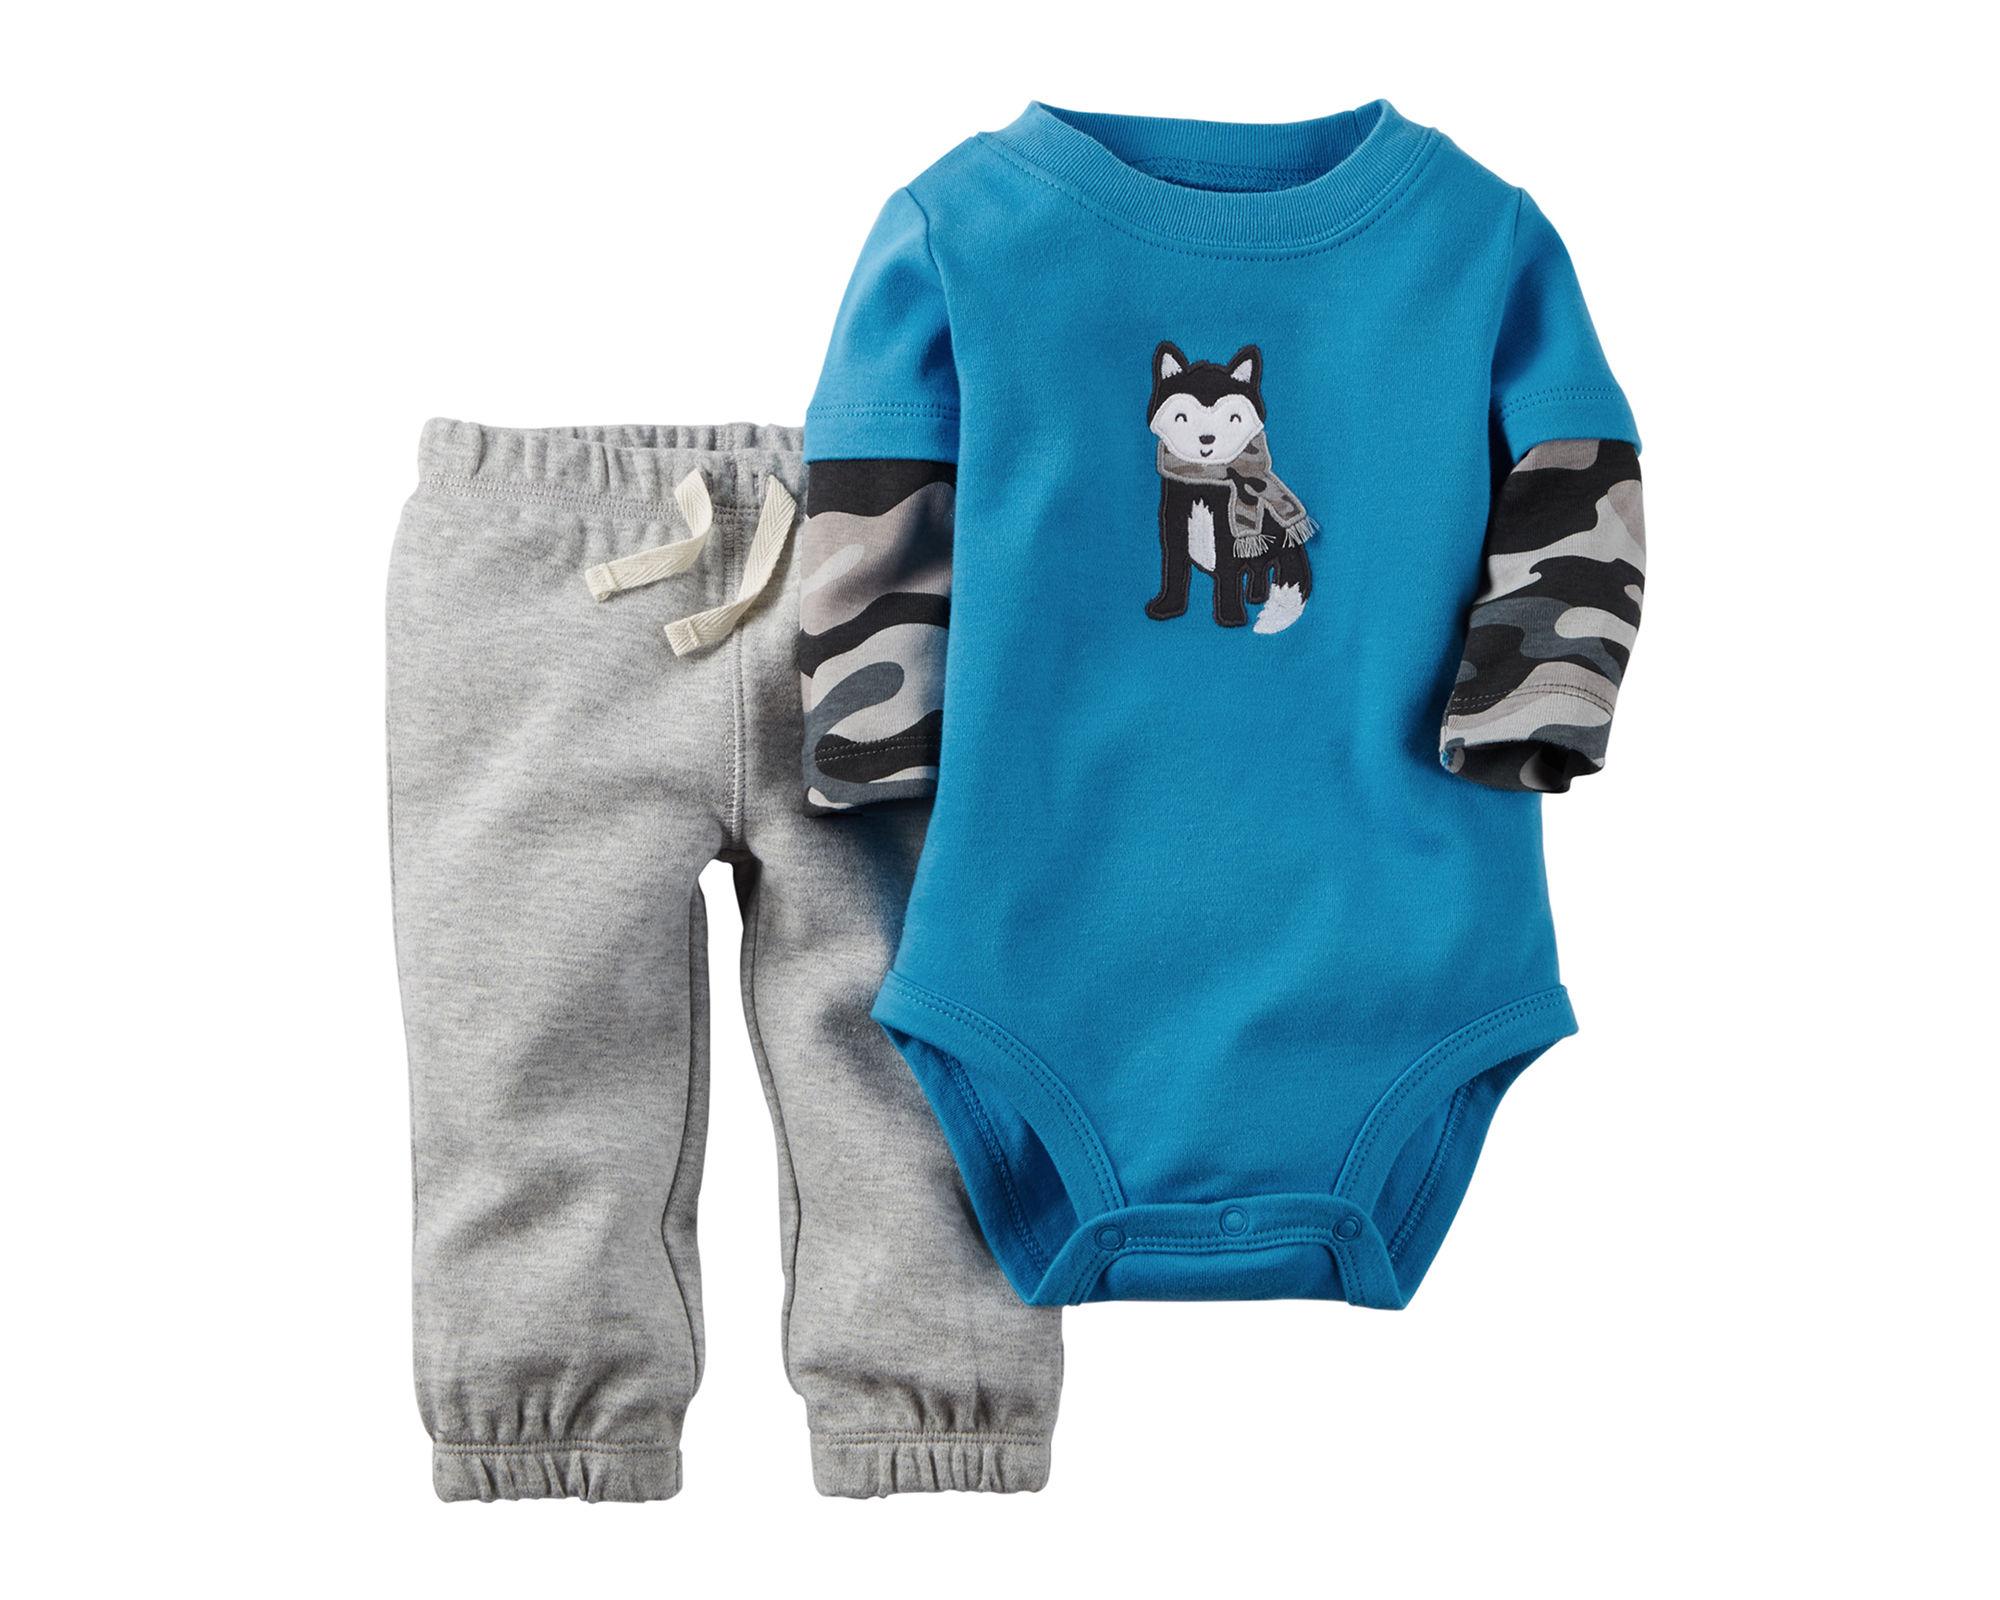 UPC Carter s Bodysuit and Pants Baby Boys newborn